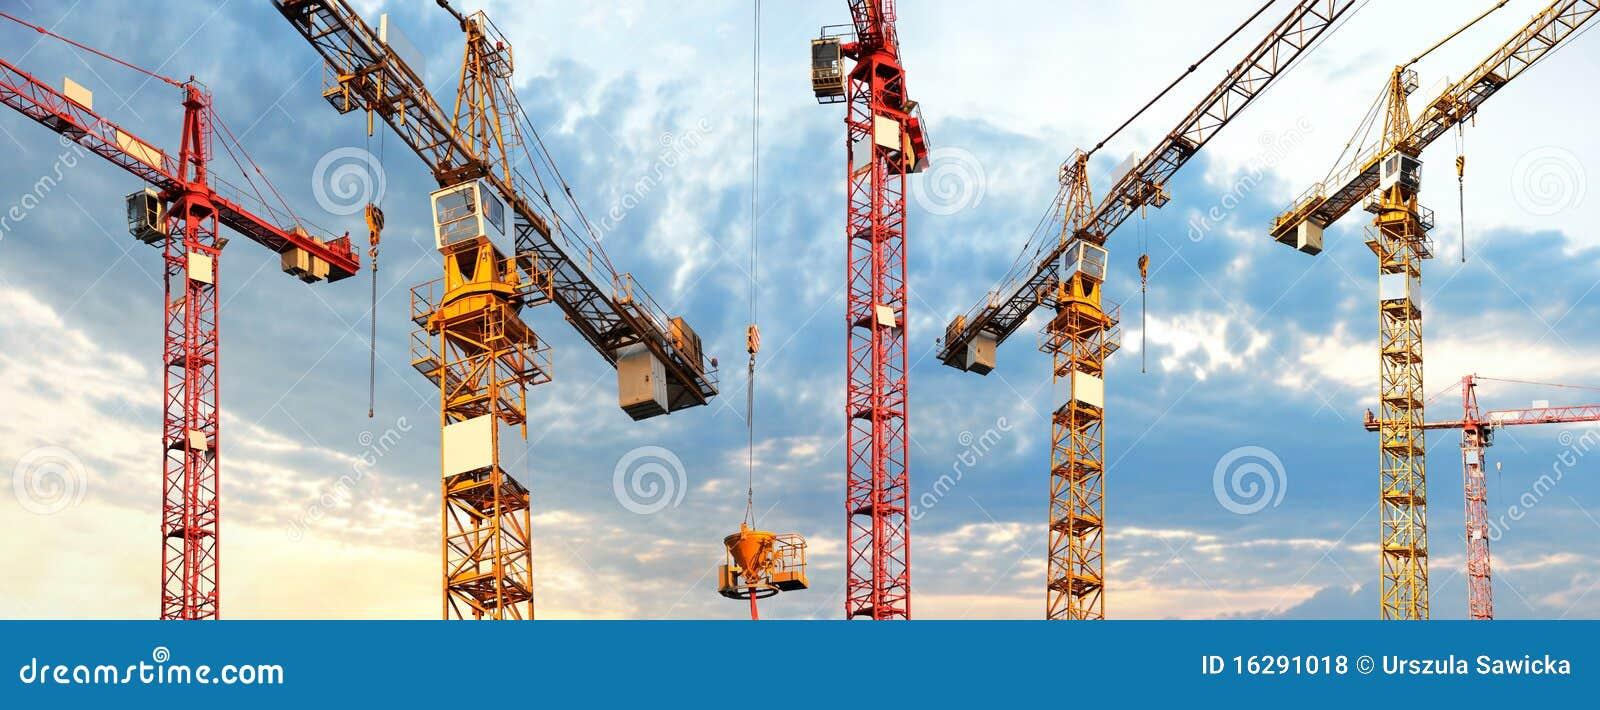 Cranes panorama